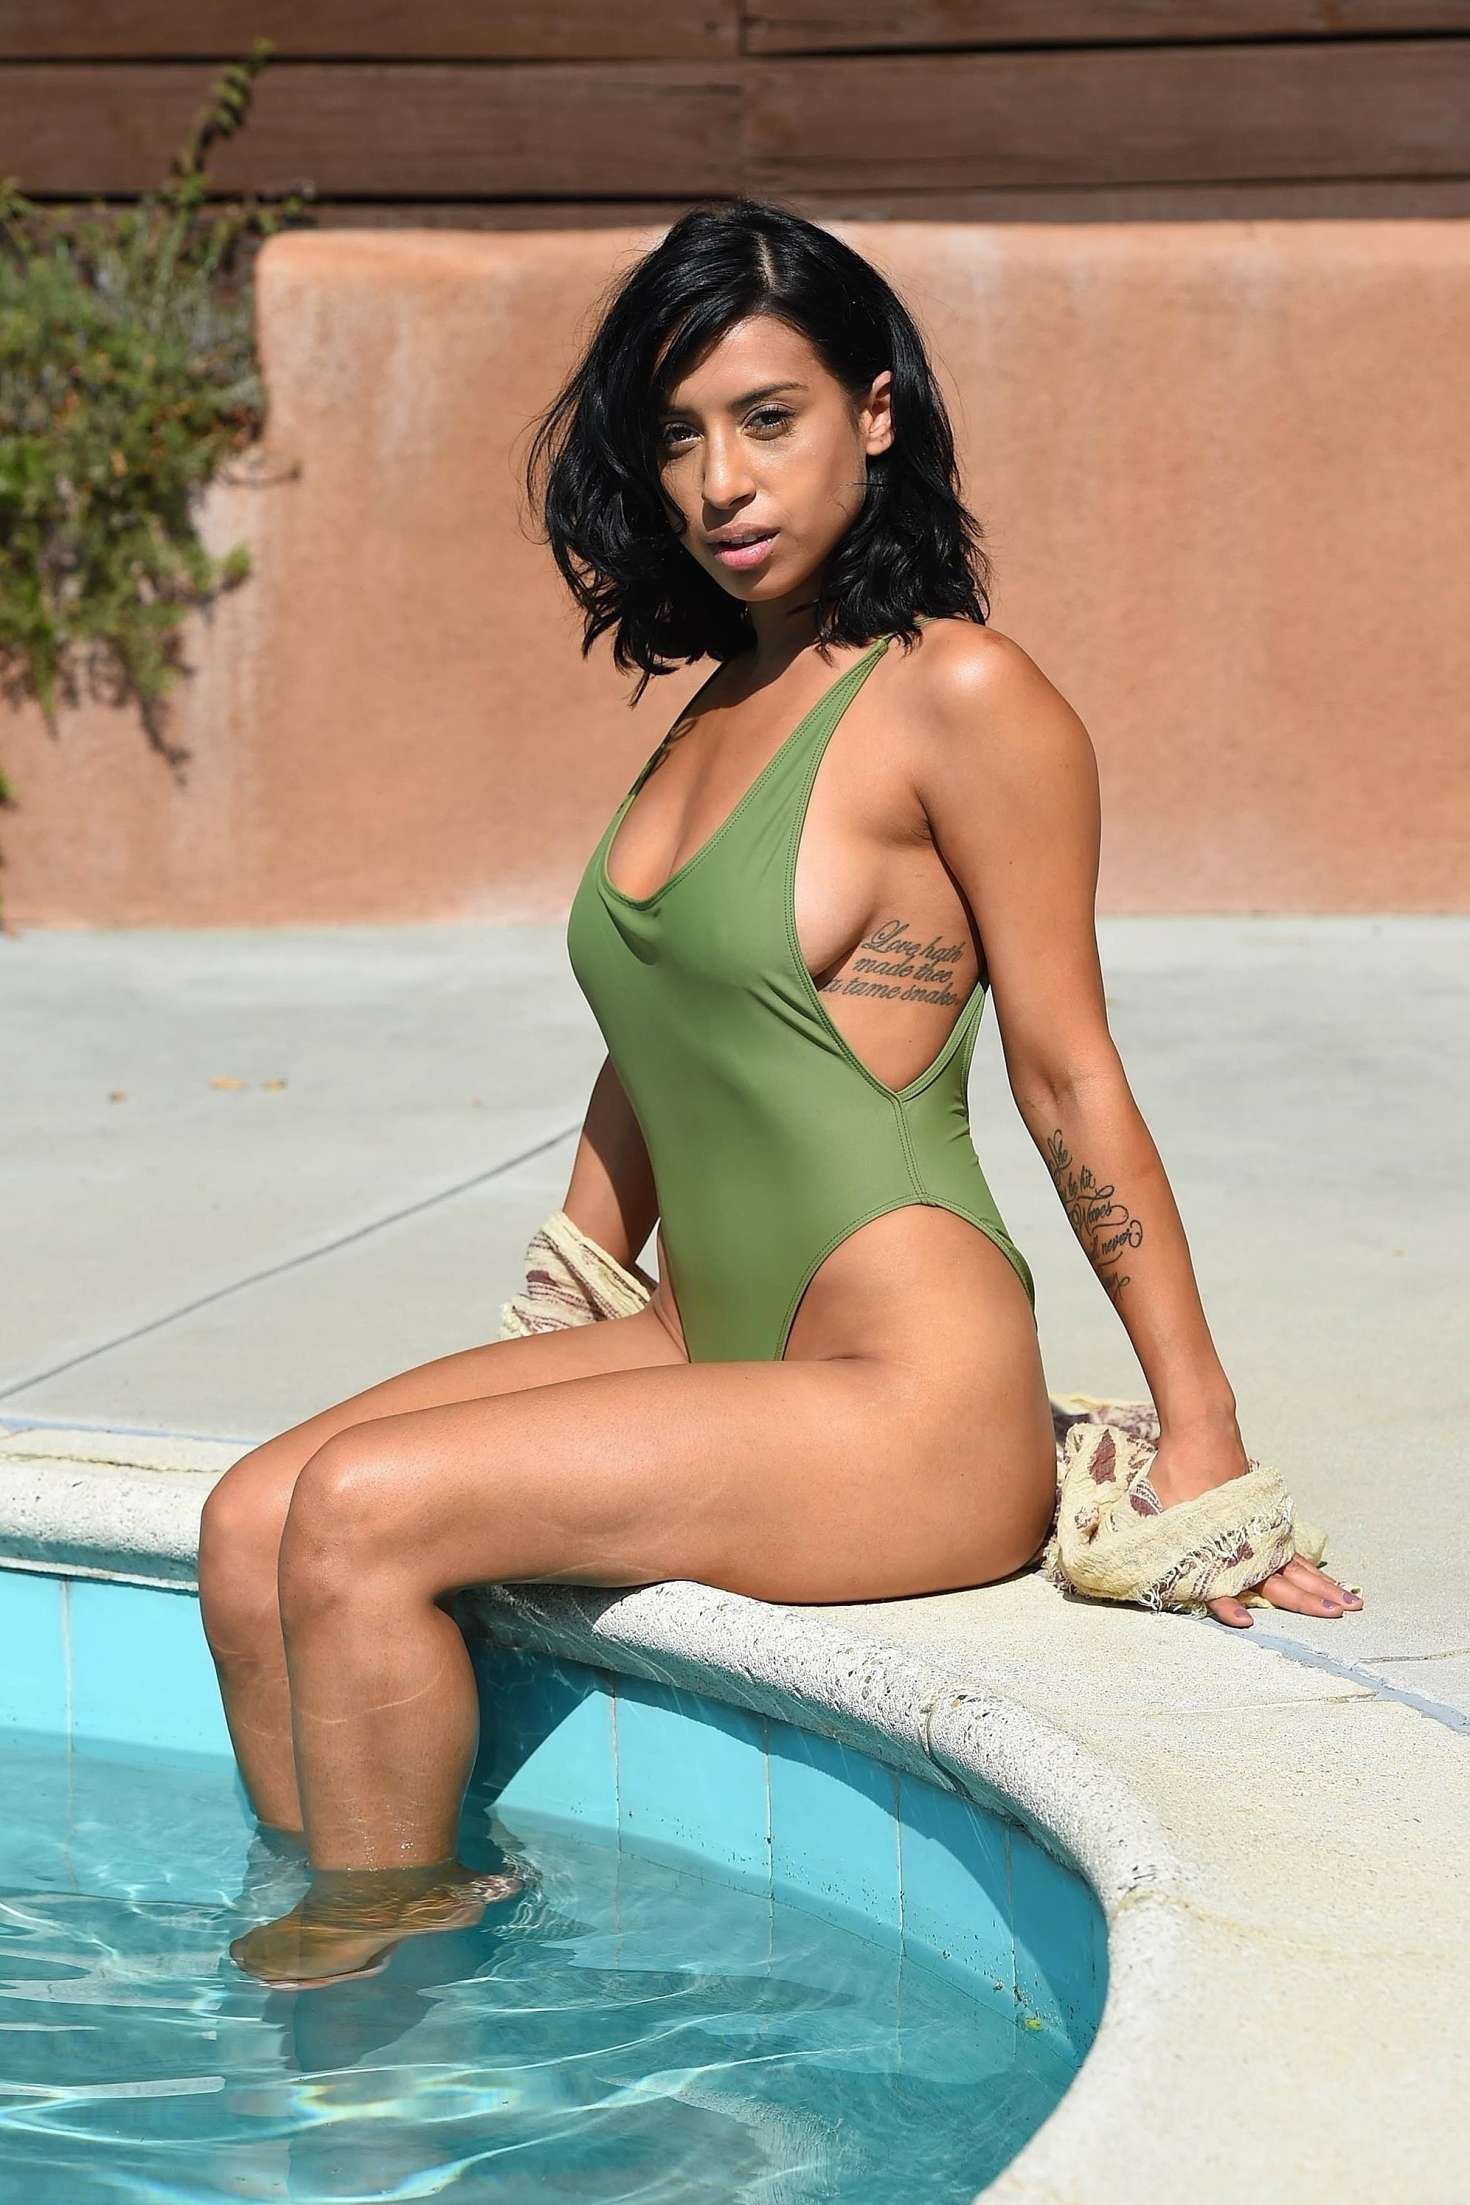 Watch Montia sabbag swimsuit video